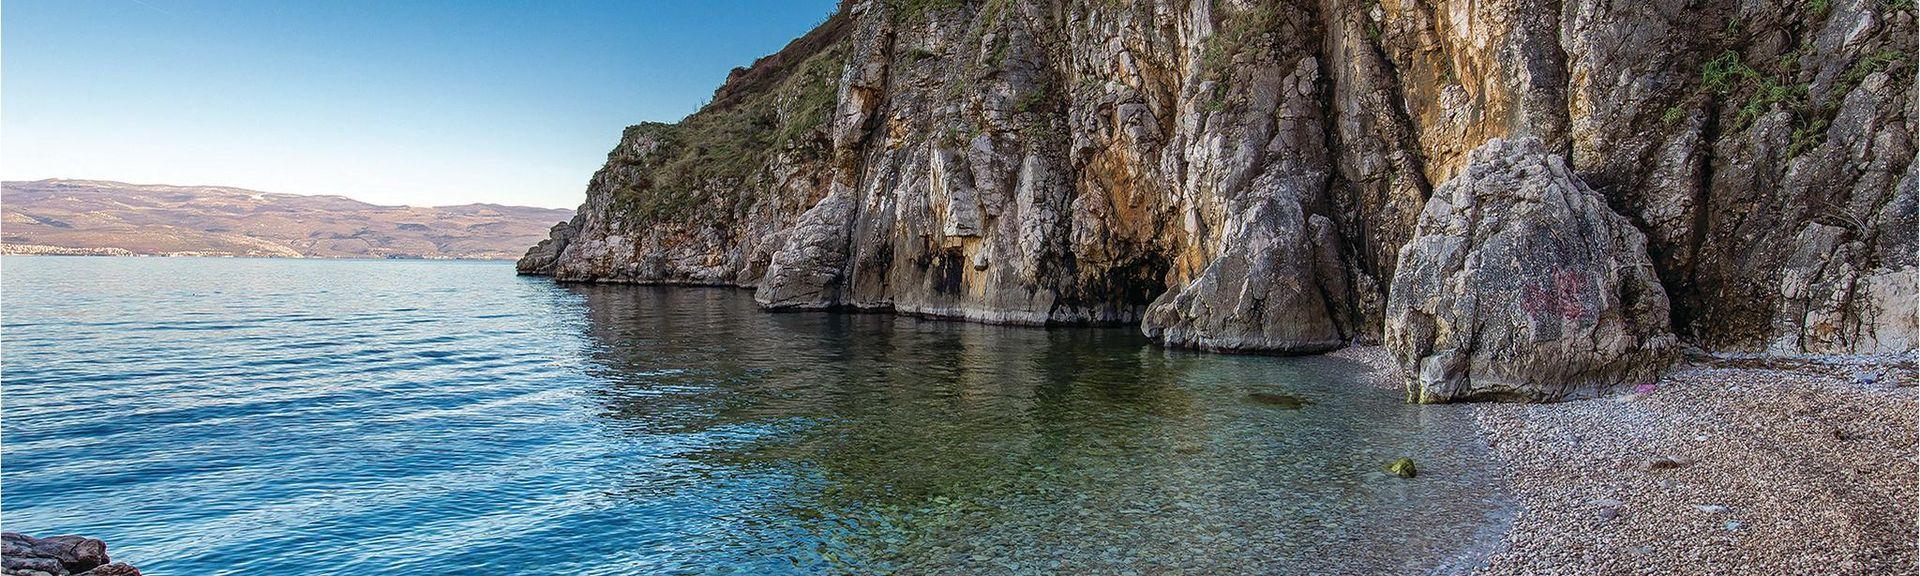 Strand van Crikvenica, Crikvenica, Primorje-Gorski Kotar, Kroatië